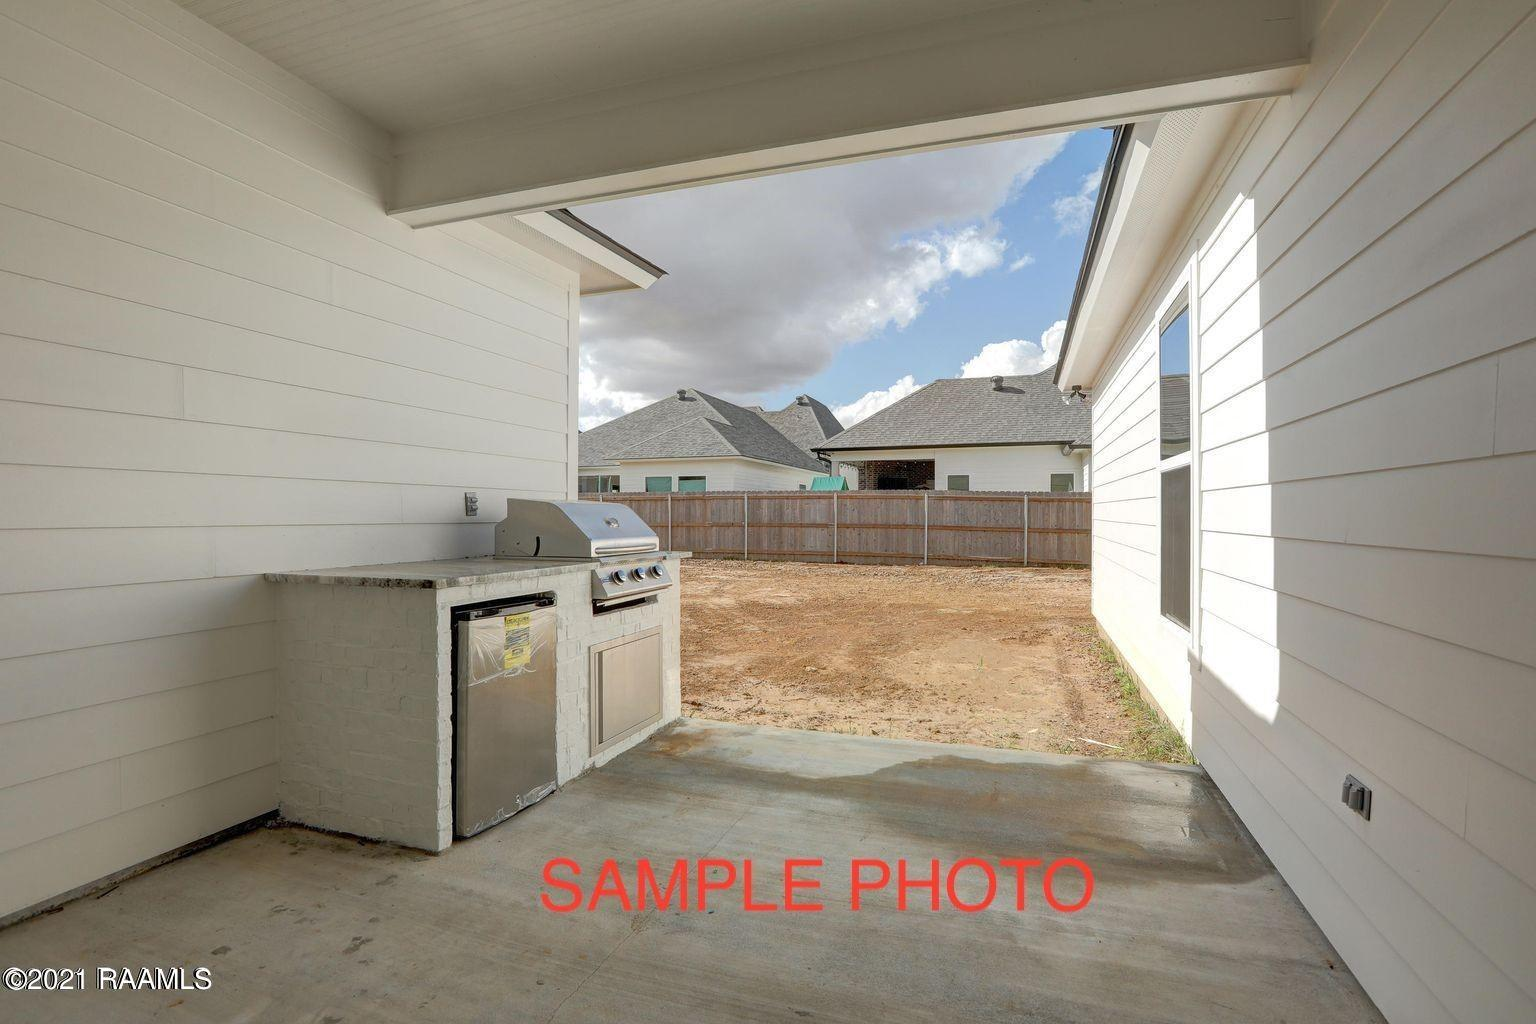 307 San Marcos Drive, Youngsville, LA 70592 Photo #7